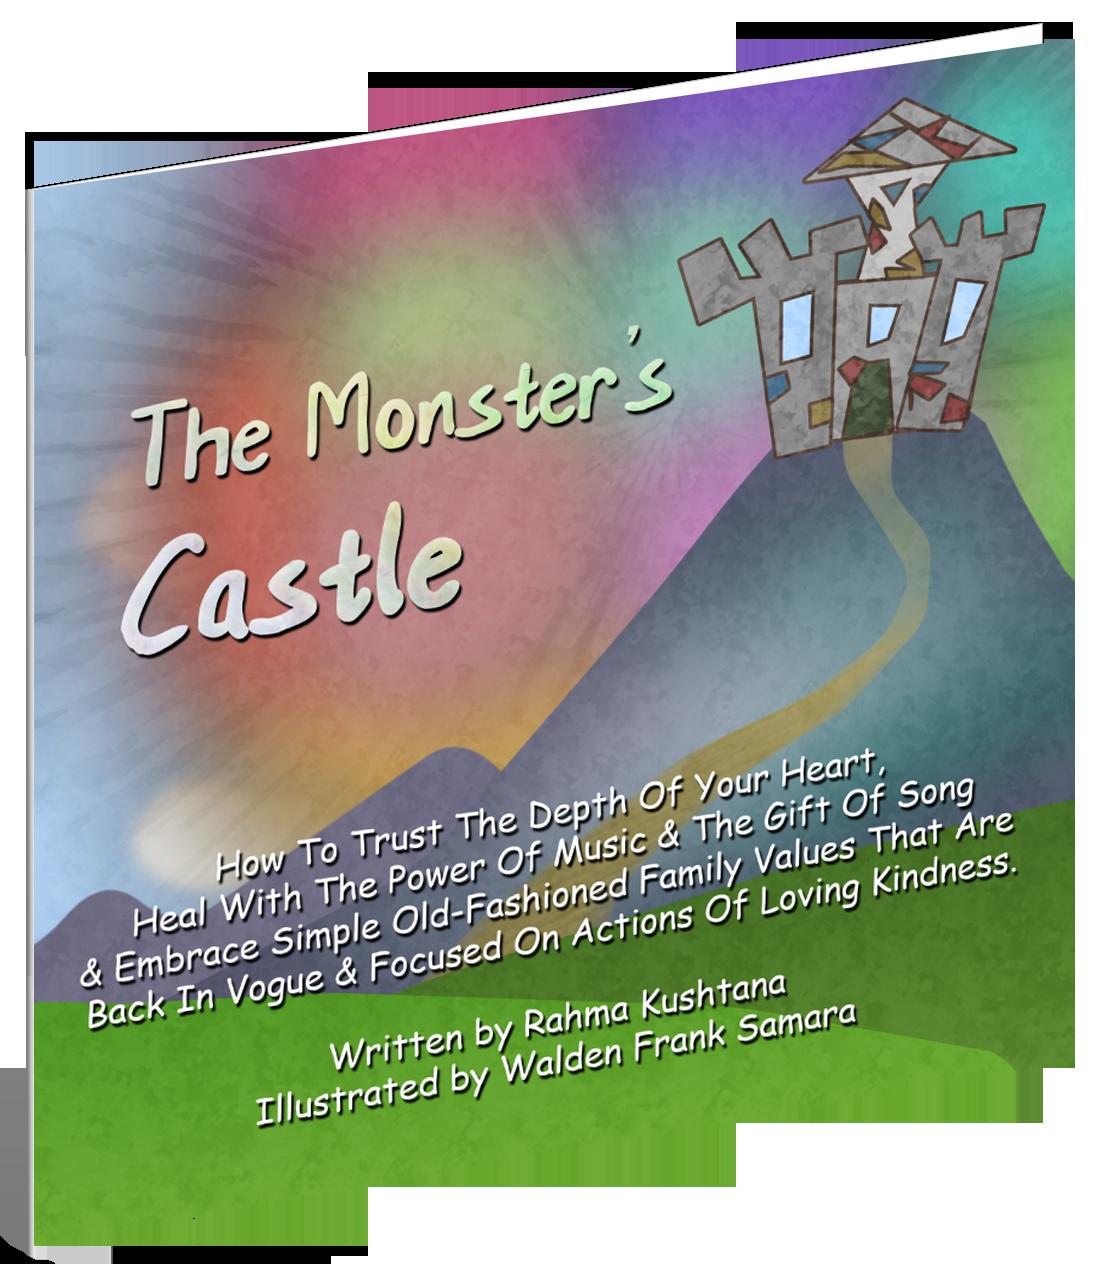 The-Monster_s-Castle-3D-Promo